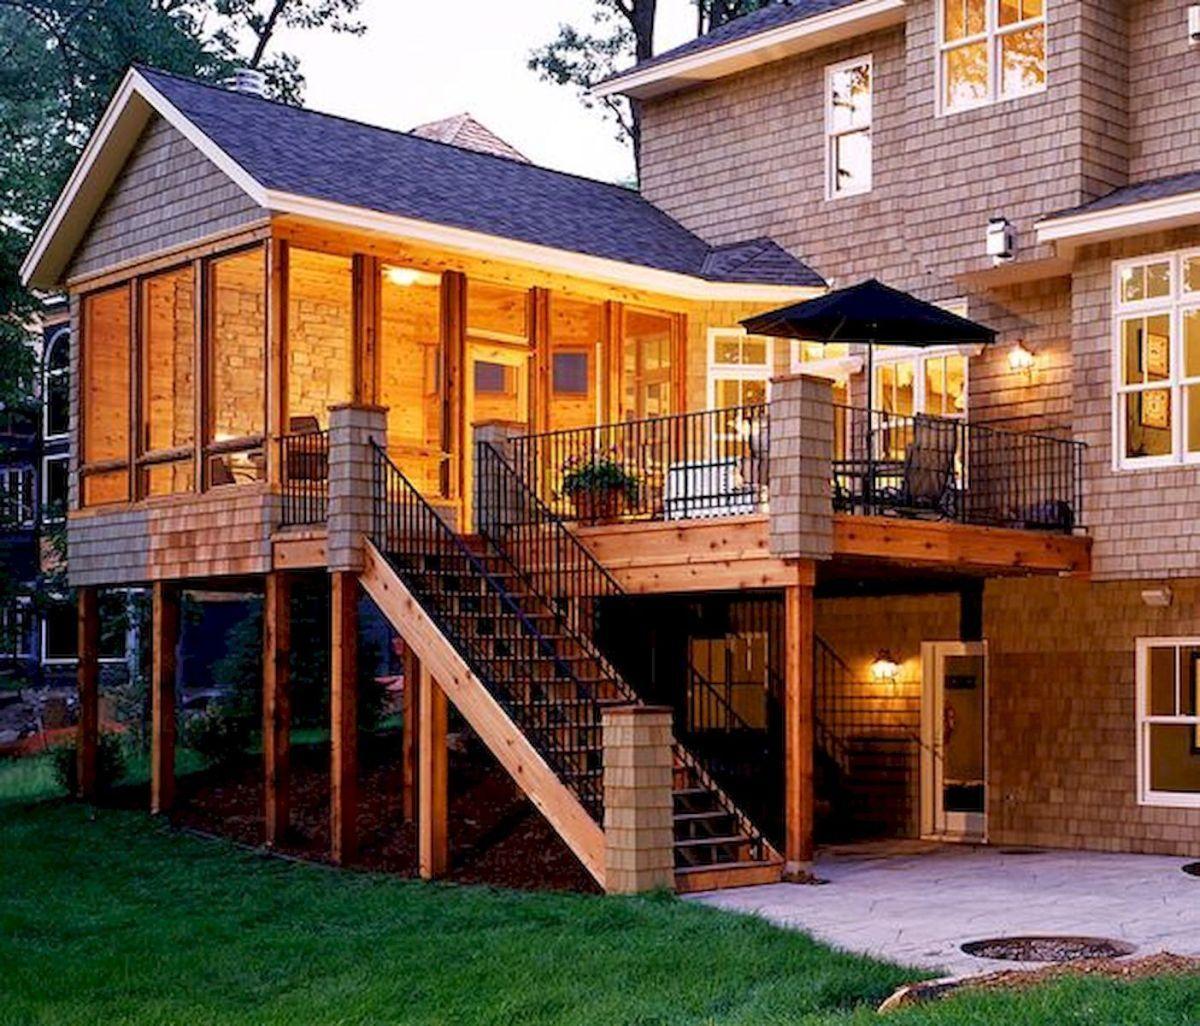 Covered Deck And Pergola Roof Design Ideas (1